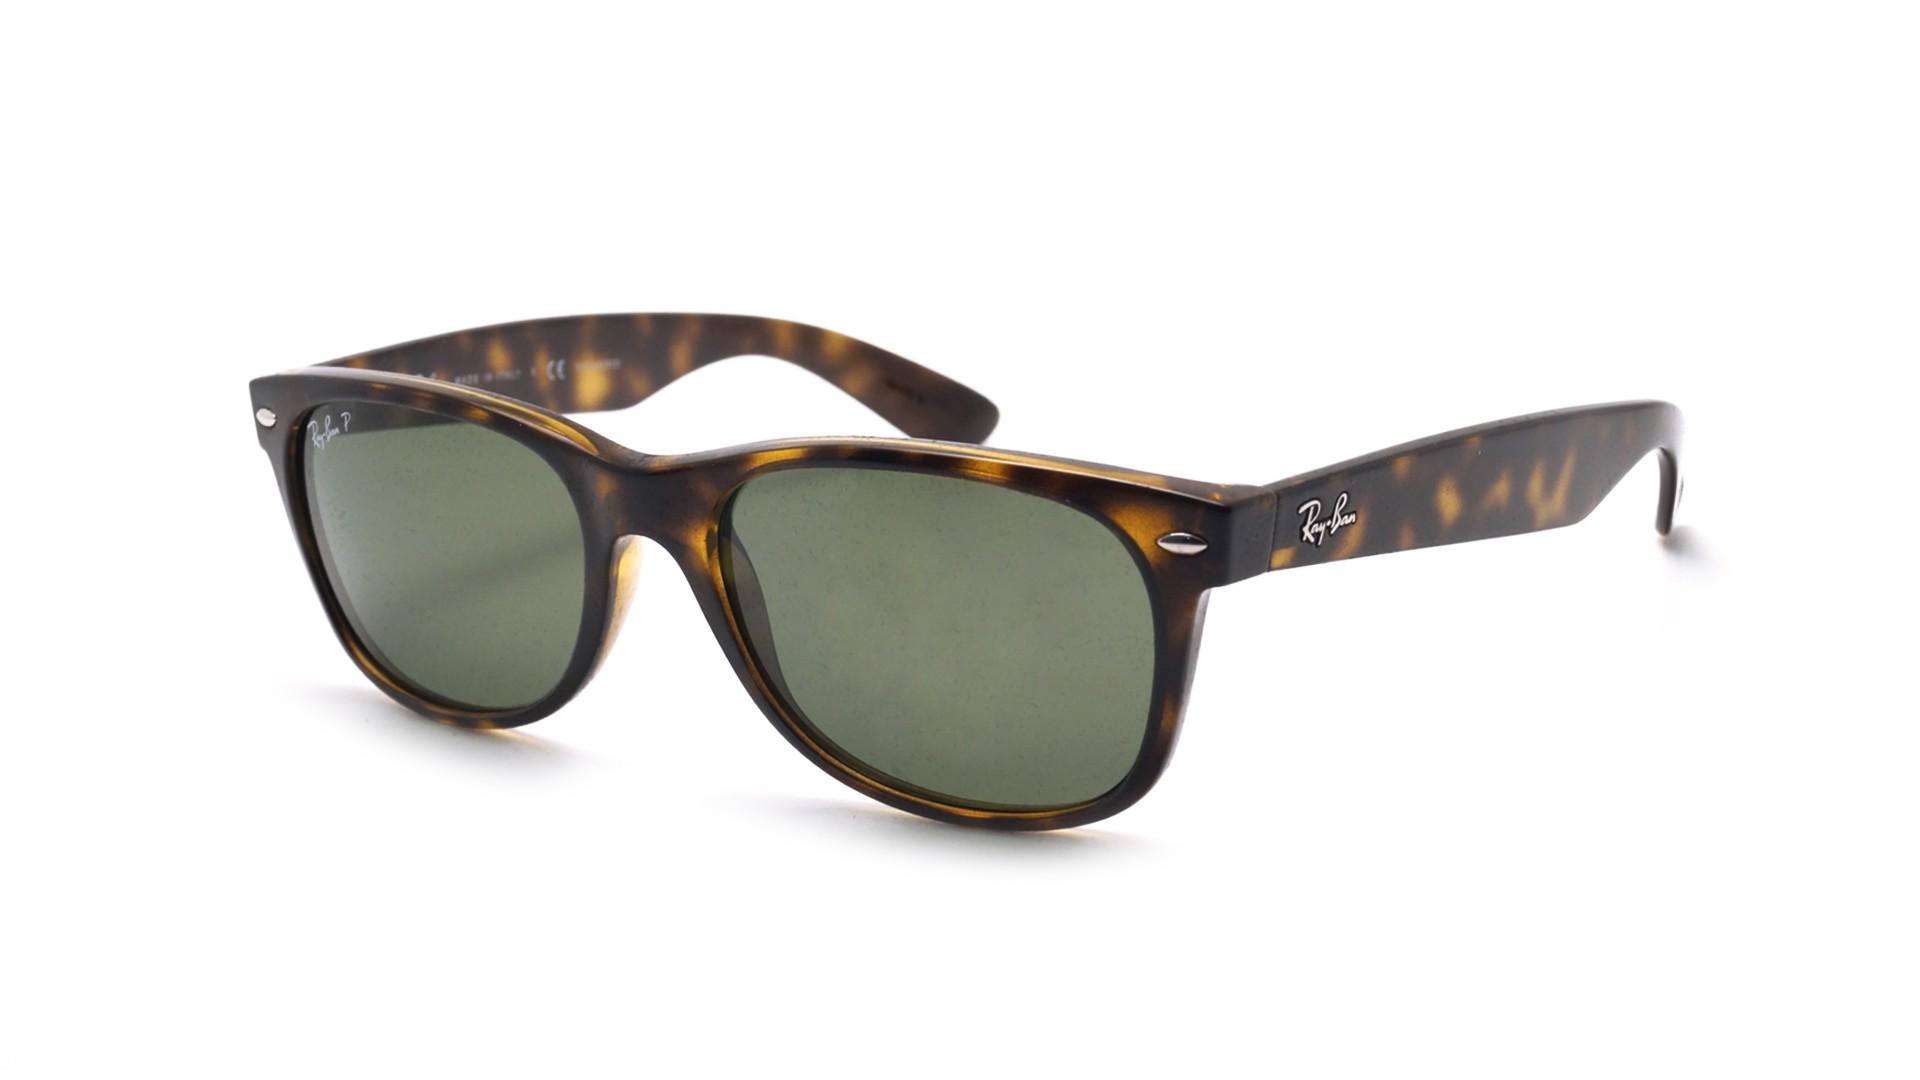 156c05357d Sunglasses Ray-Ban New Wayfarer Tortoise RB2132 902 58 52-18 Small Polarized